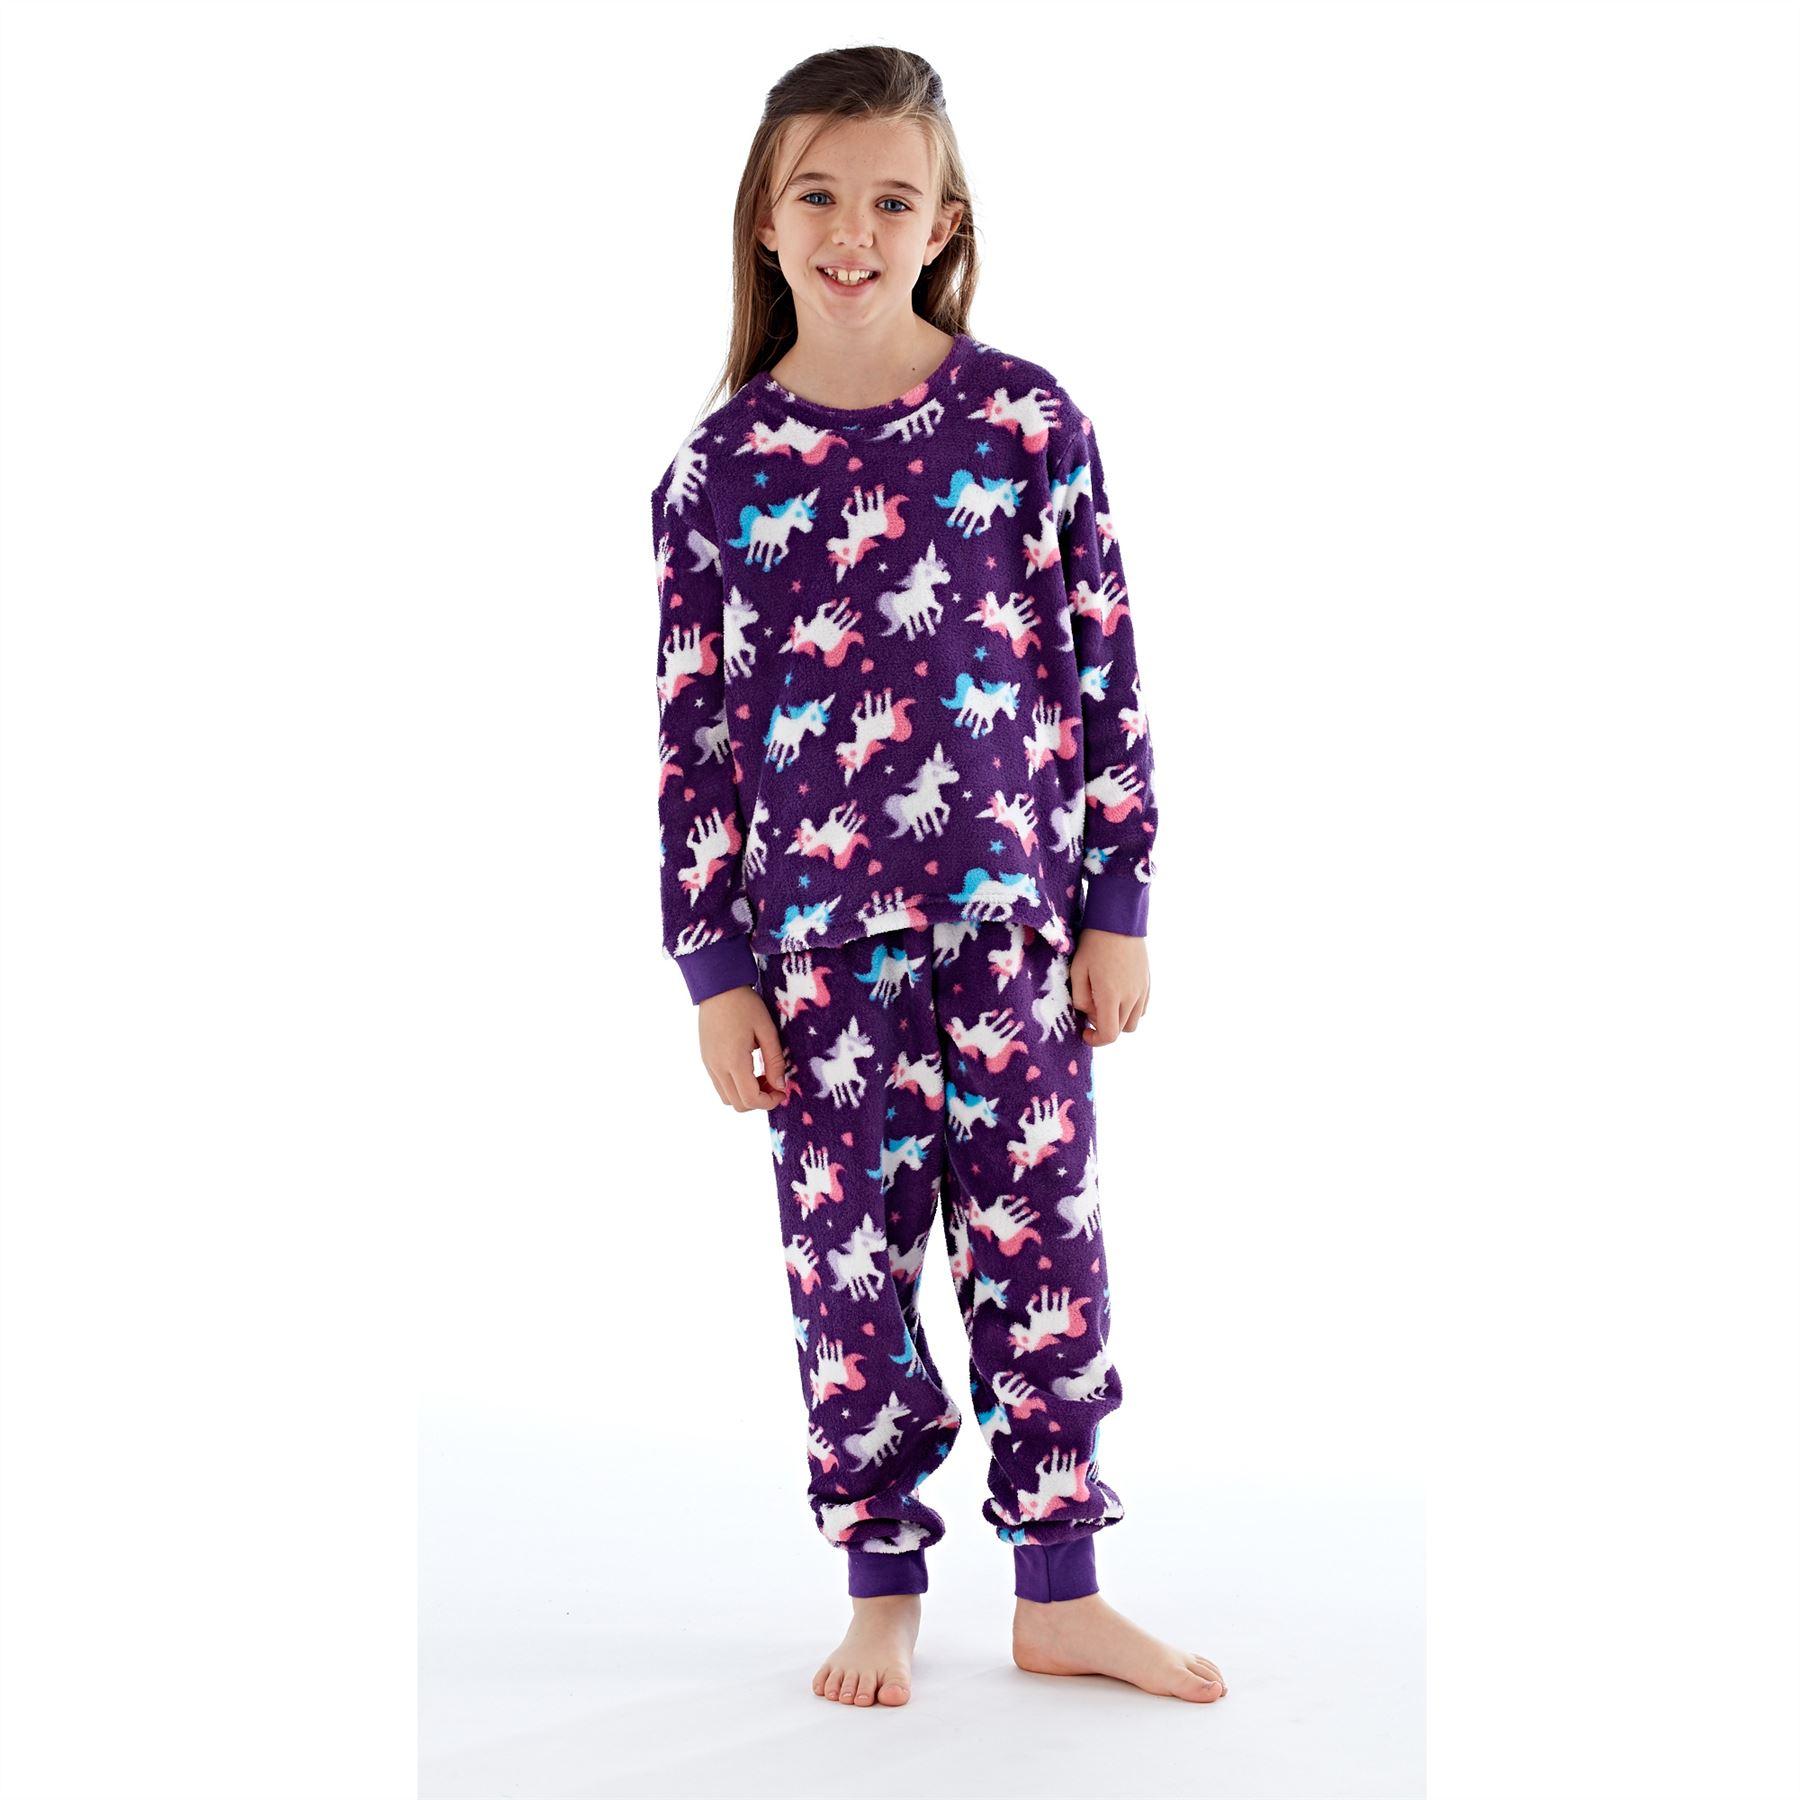 Girls-Boys-Fleece-Pyjamas-Childrens-Pyjama-Set-Kids-PJs-Age-2-13-Years thumbnail 7